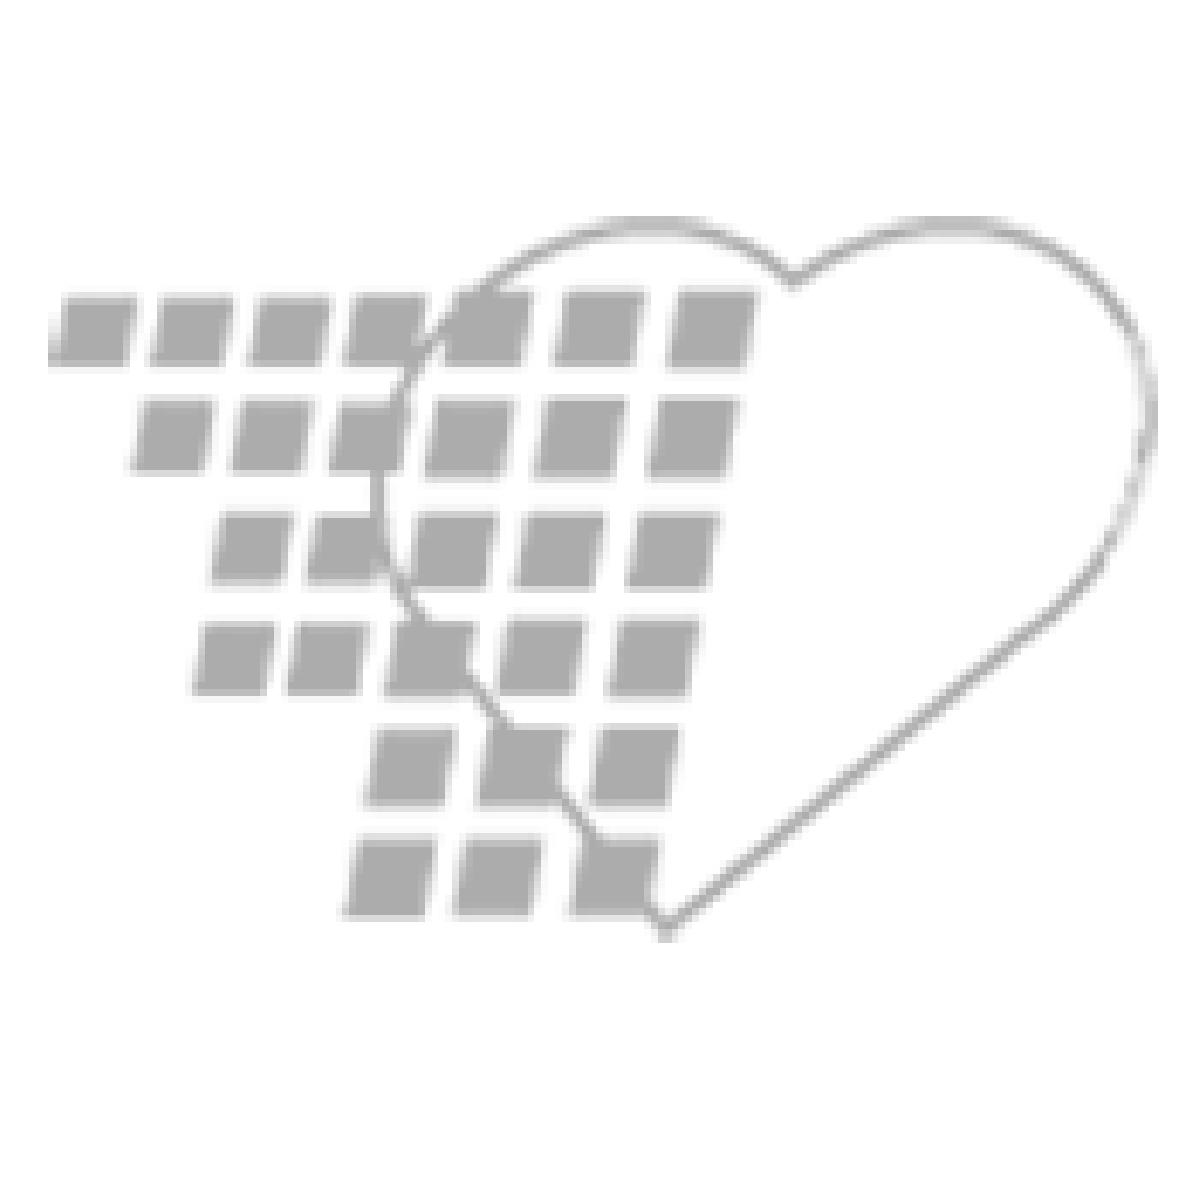 02-38-3144 - Accu-Chek Compact Test Strip Drums